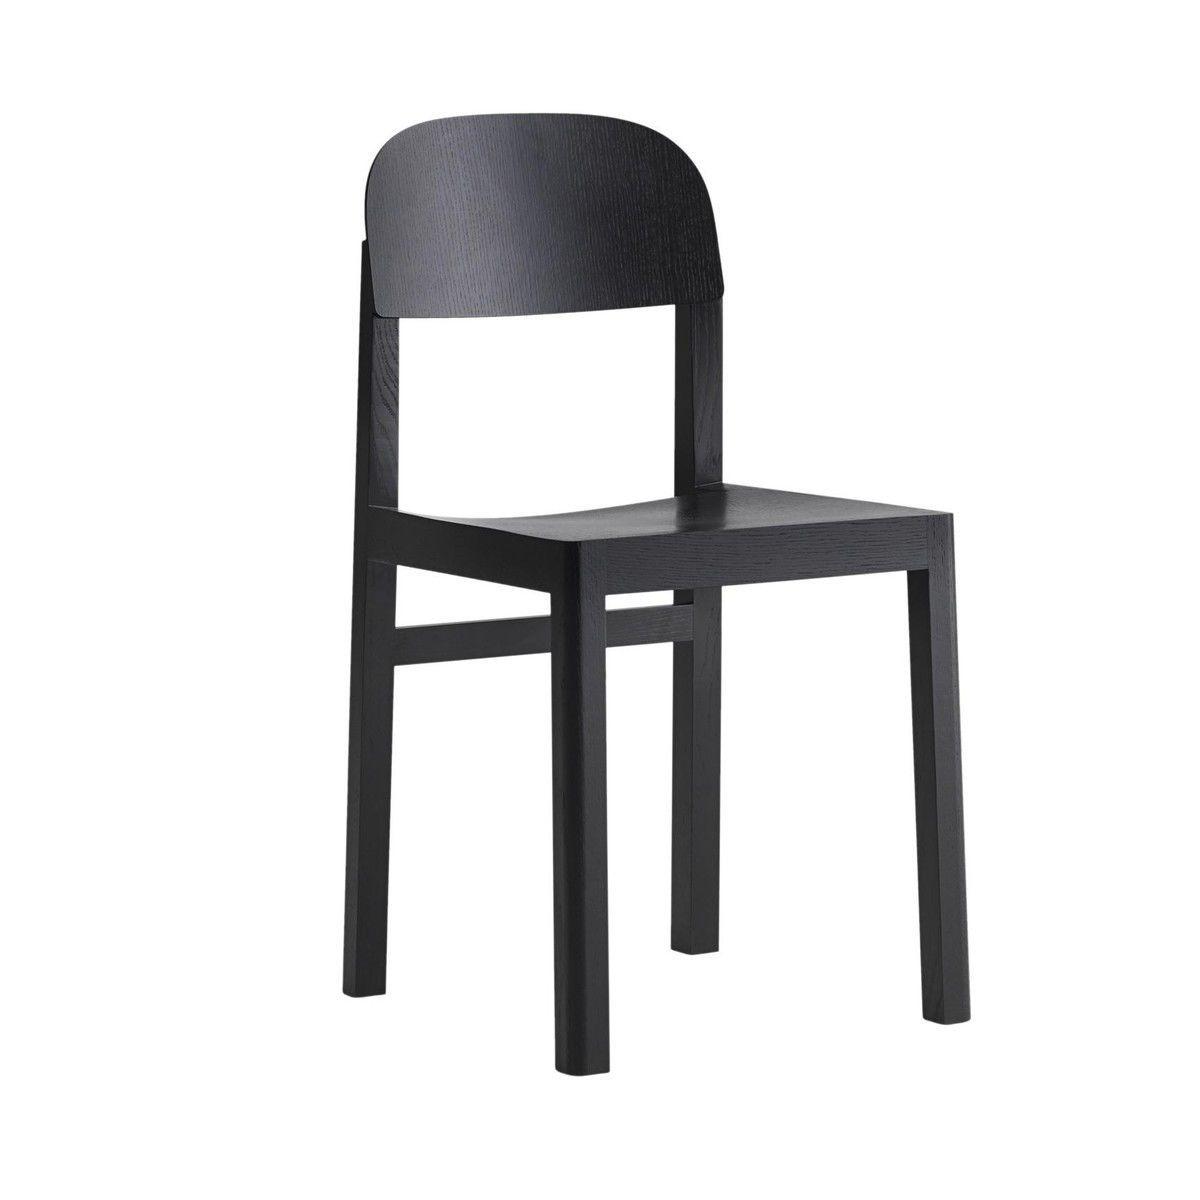 workshop chair muuto. Black Bedroom Furniture Sets. Home Design Ideas